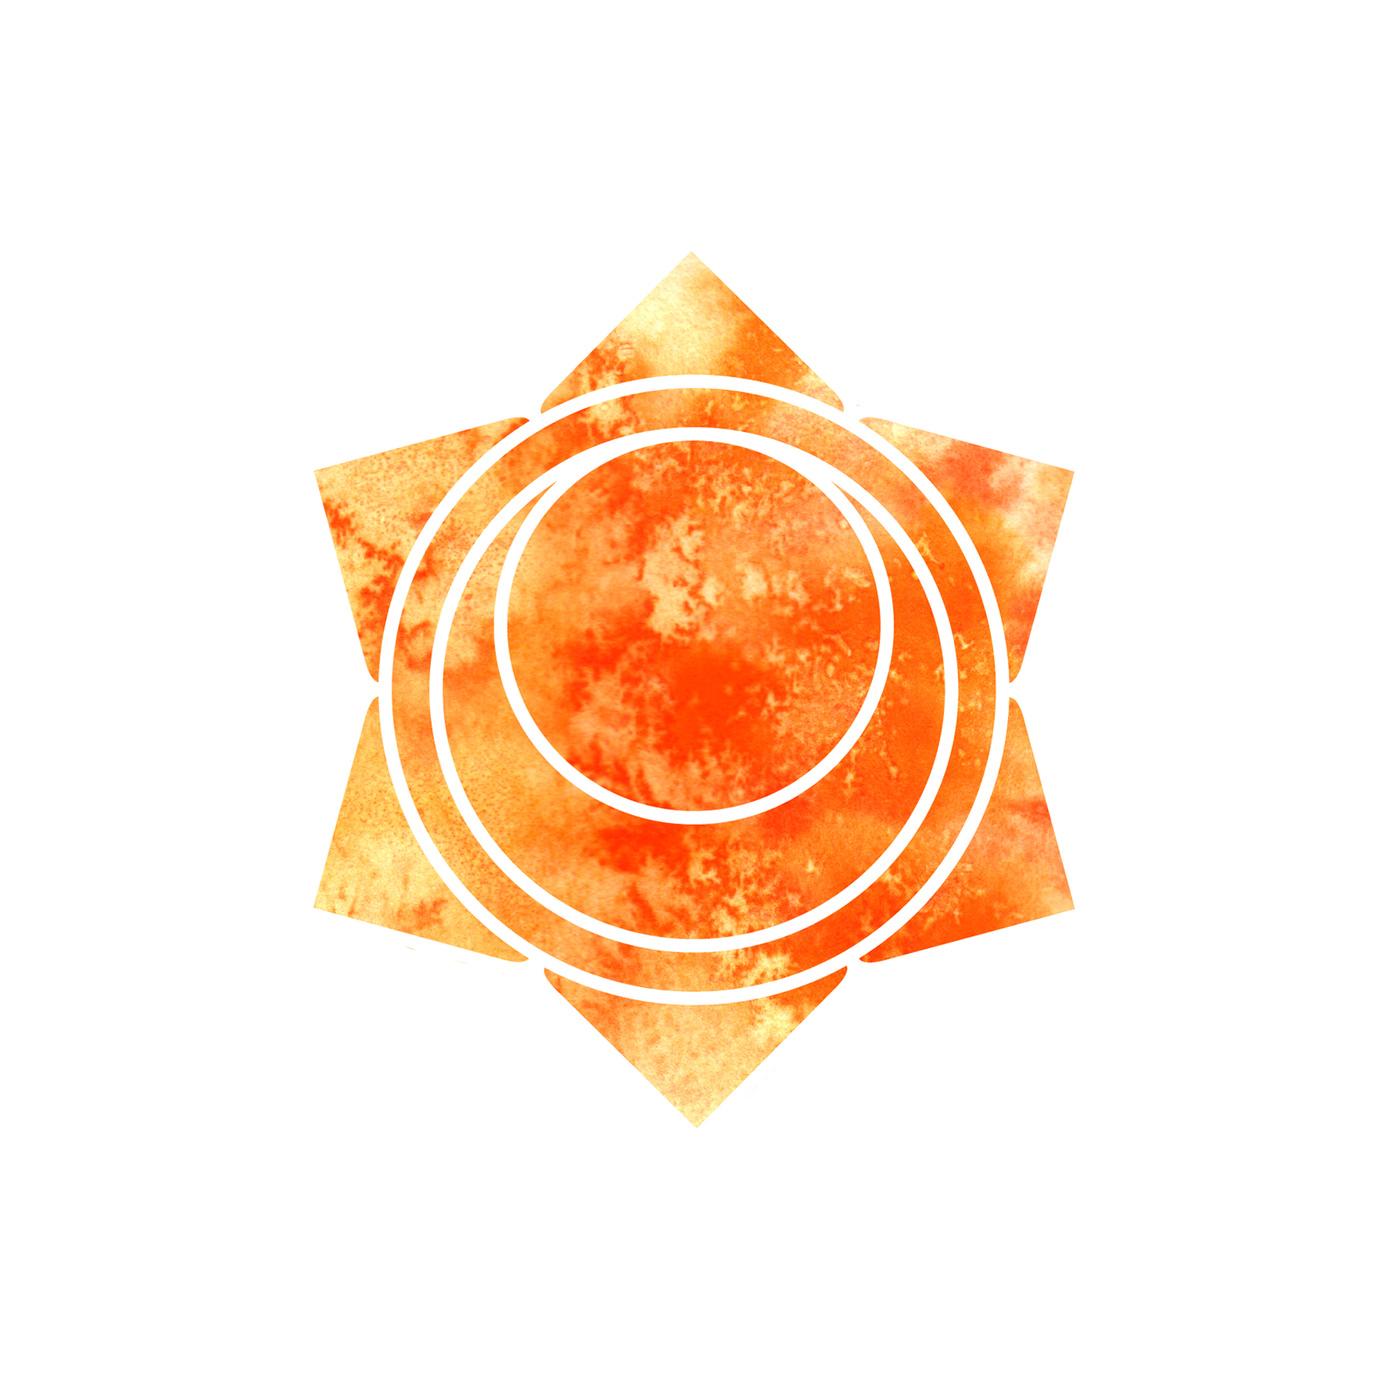 Svadhisthana: Sacral Chakra